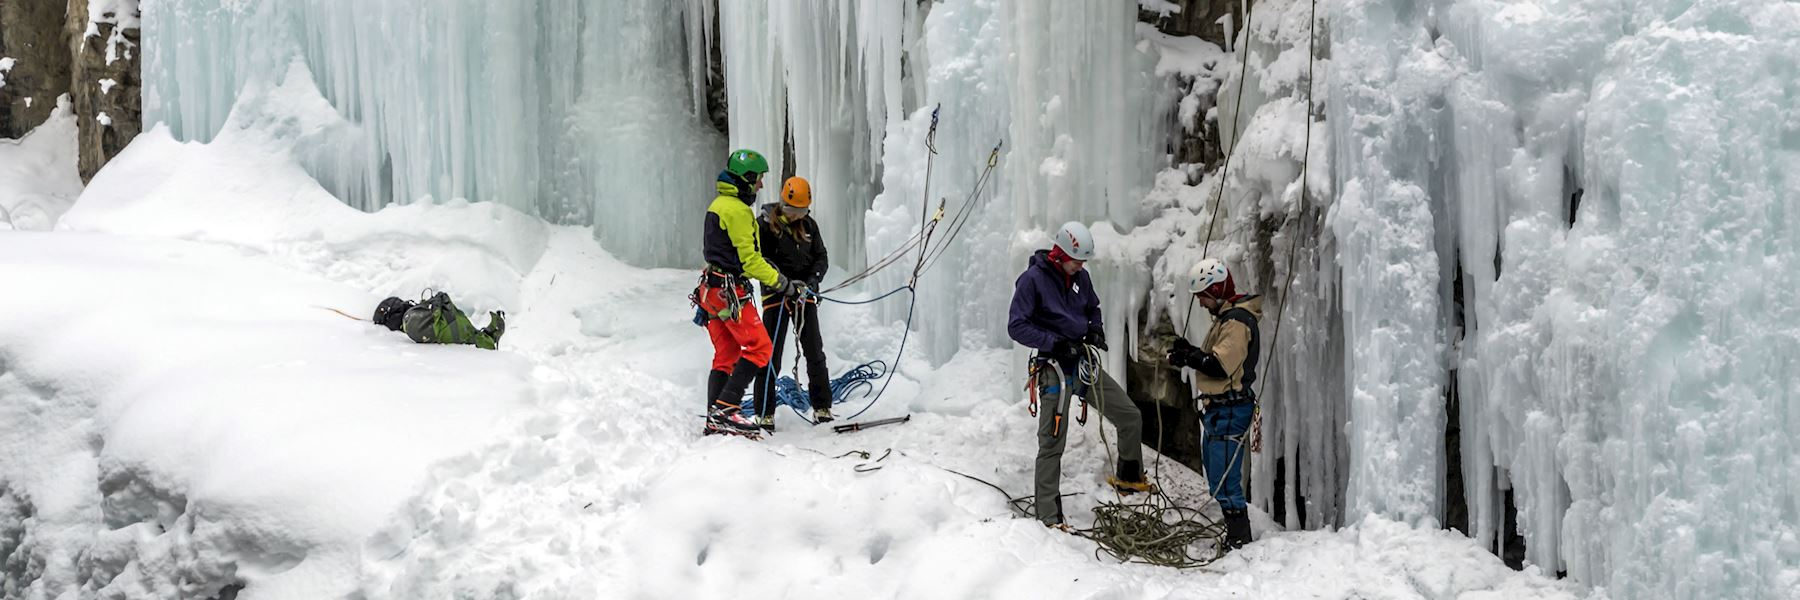 Frozen waterfall ice climbing experience